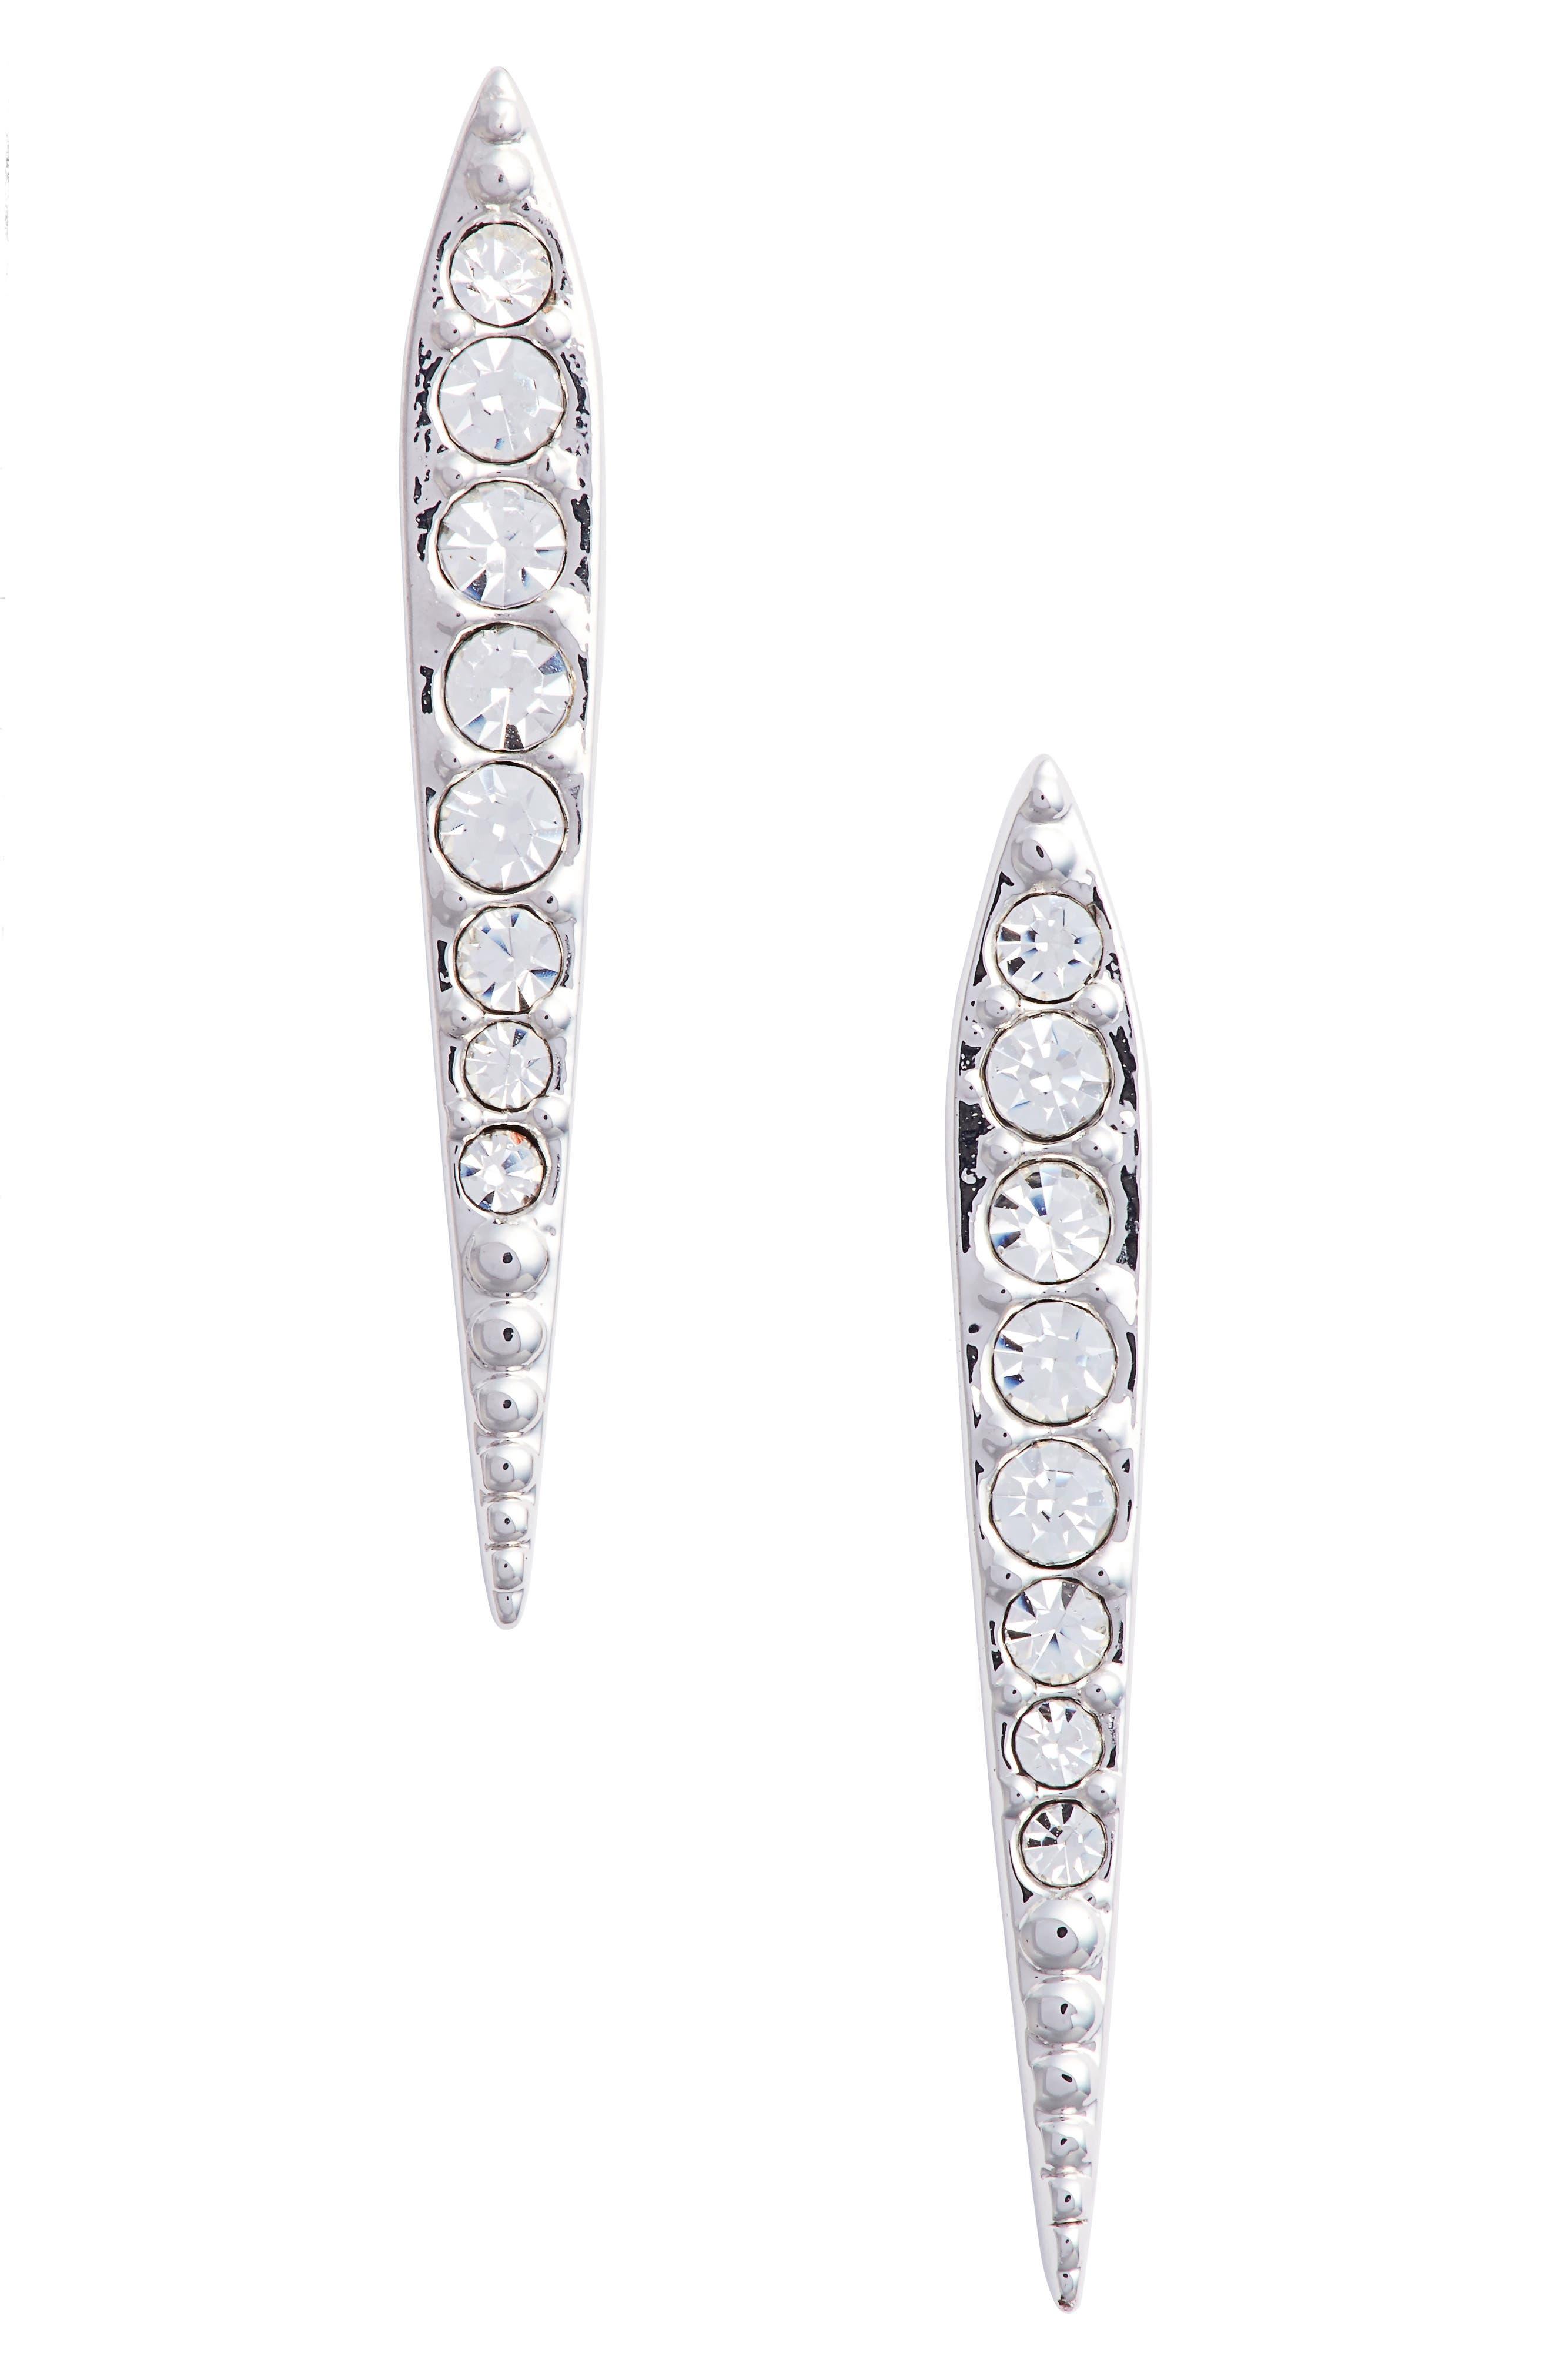 Cubic Zirconia Drop Earrings,                             Main thumbnail 1, color,                             040